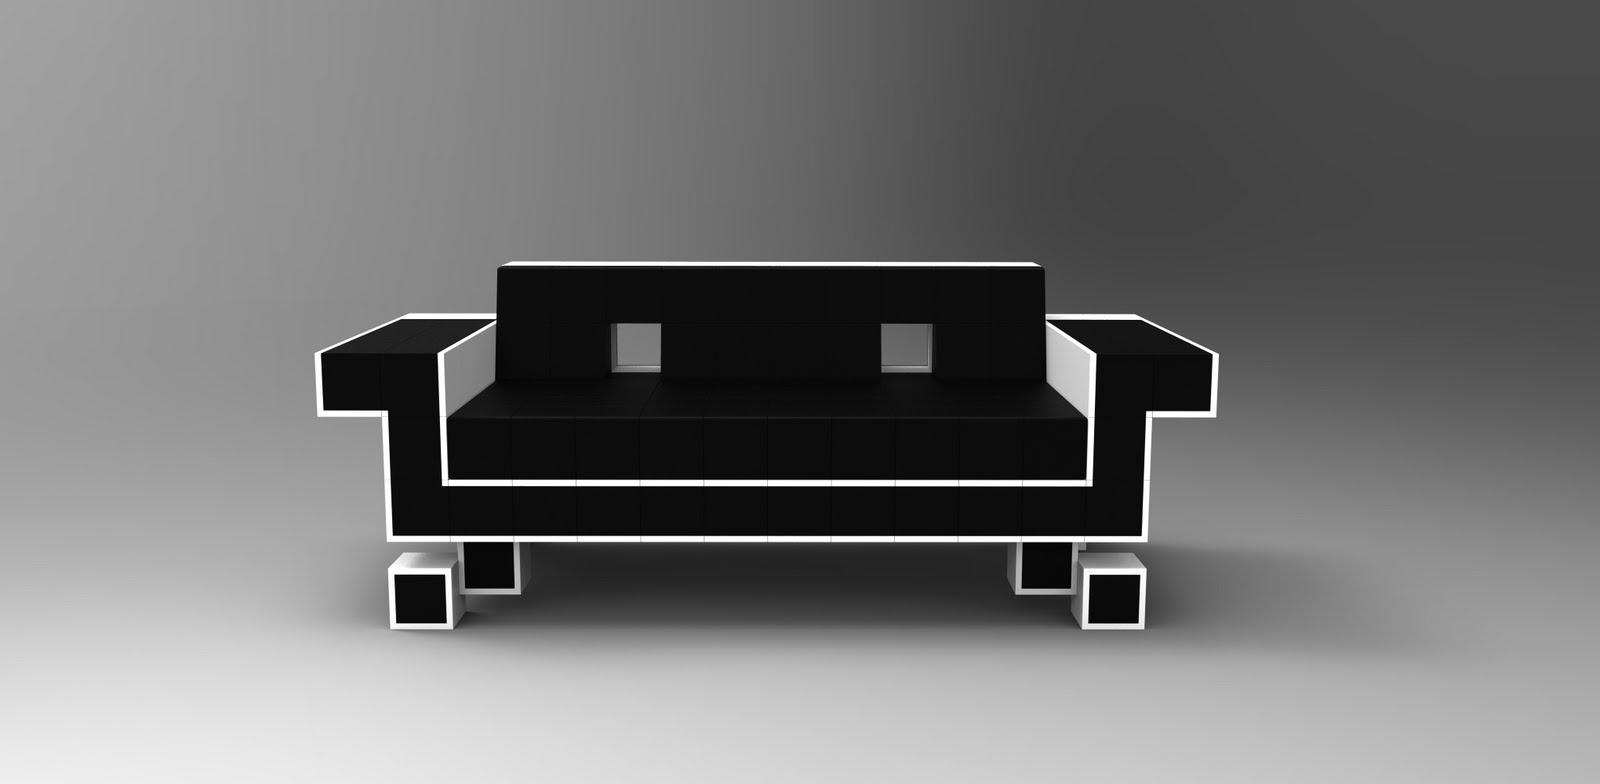 fruitless pursuits 8 bit furniture invades your living space. Black Bedroom Furniture Sets. Home Design Ideas